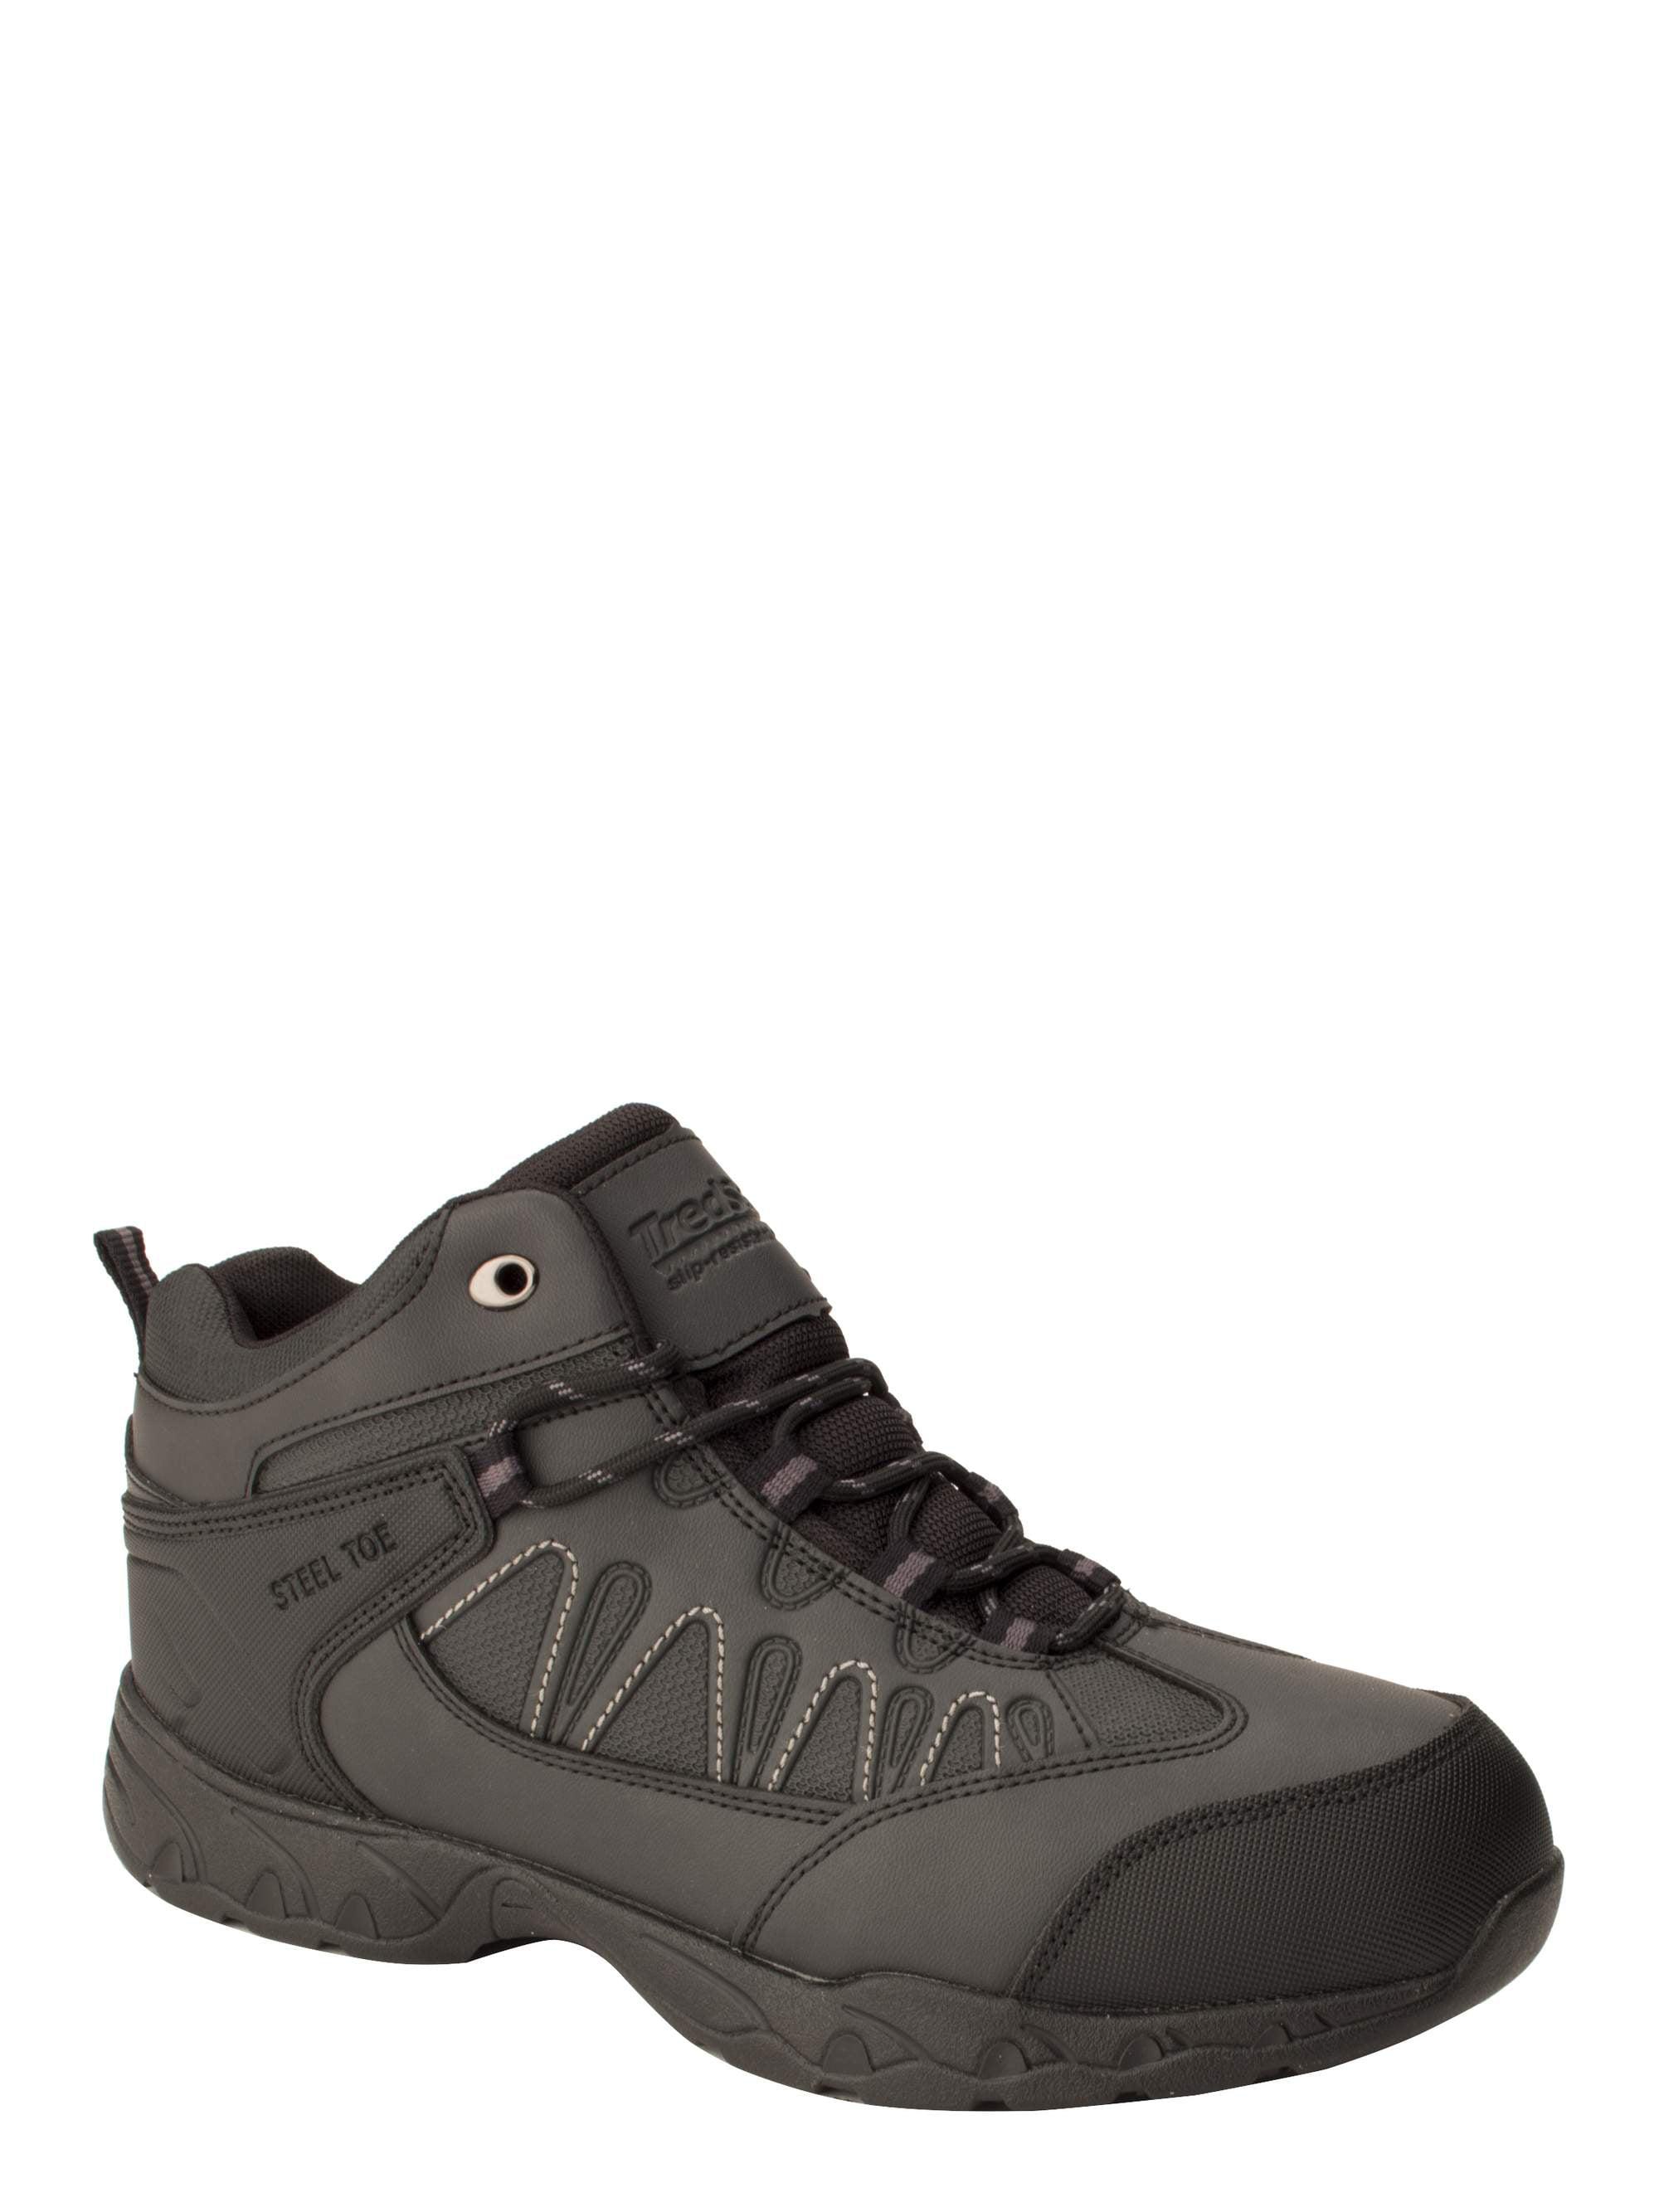 Tredsafe Men's Nola Steel Toe Slip-Resistant Hiker by HYI